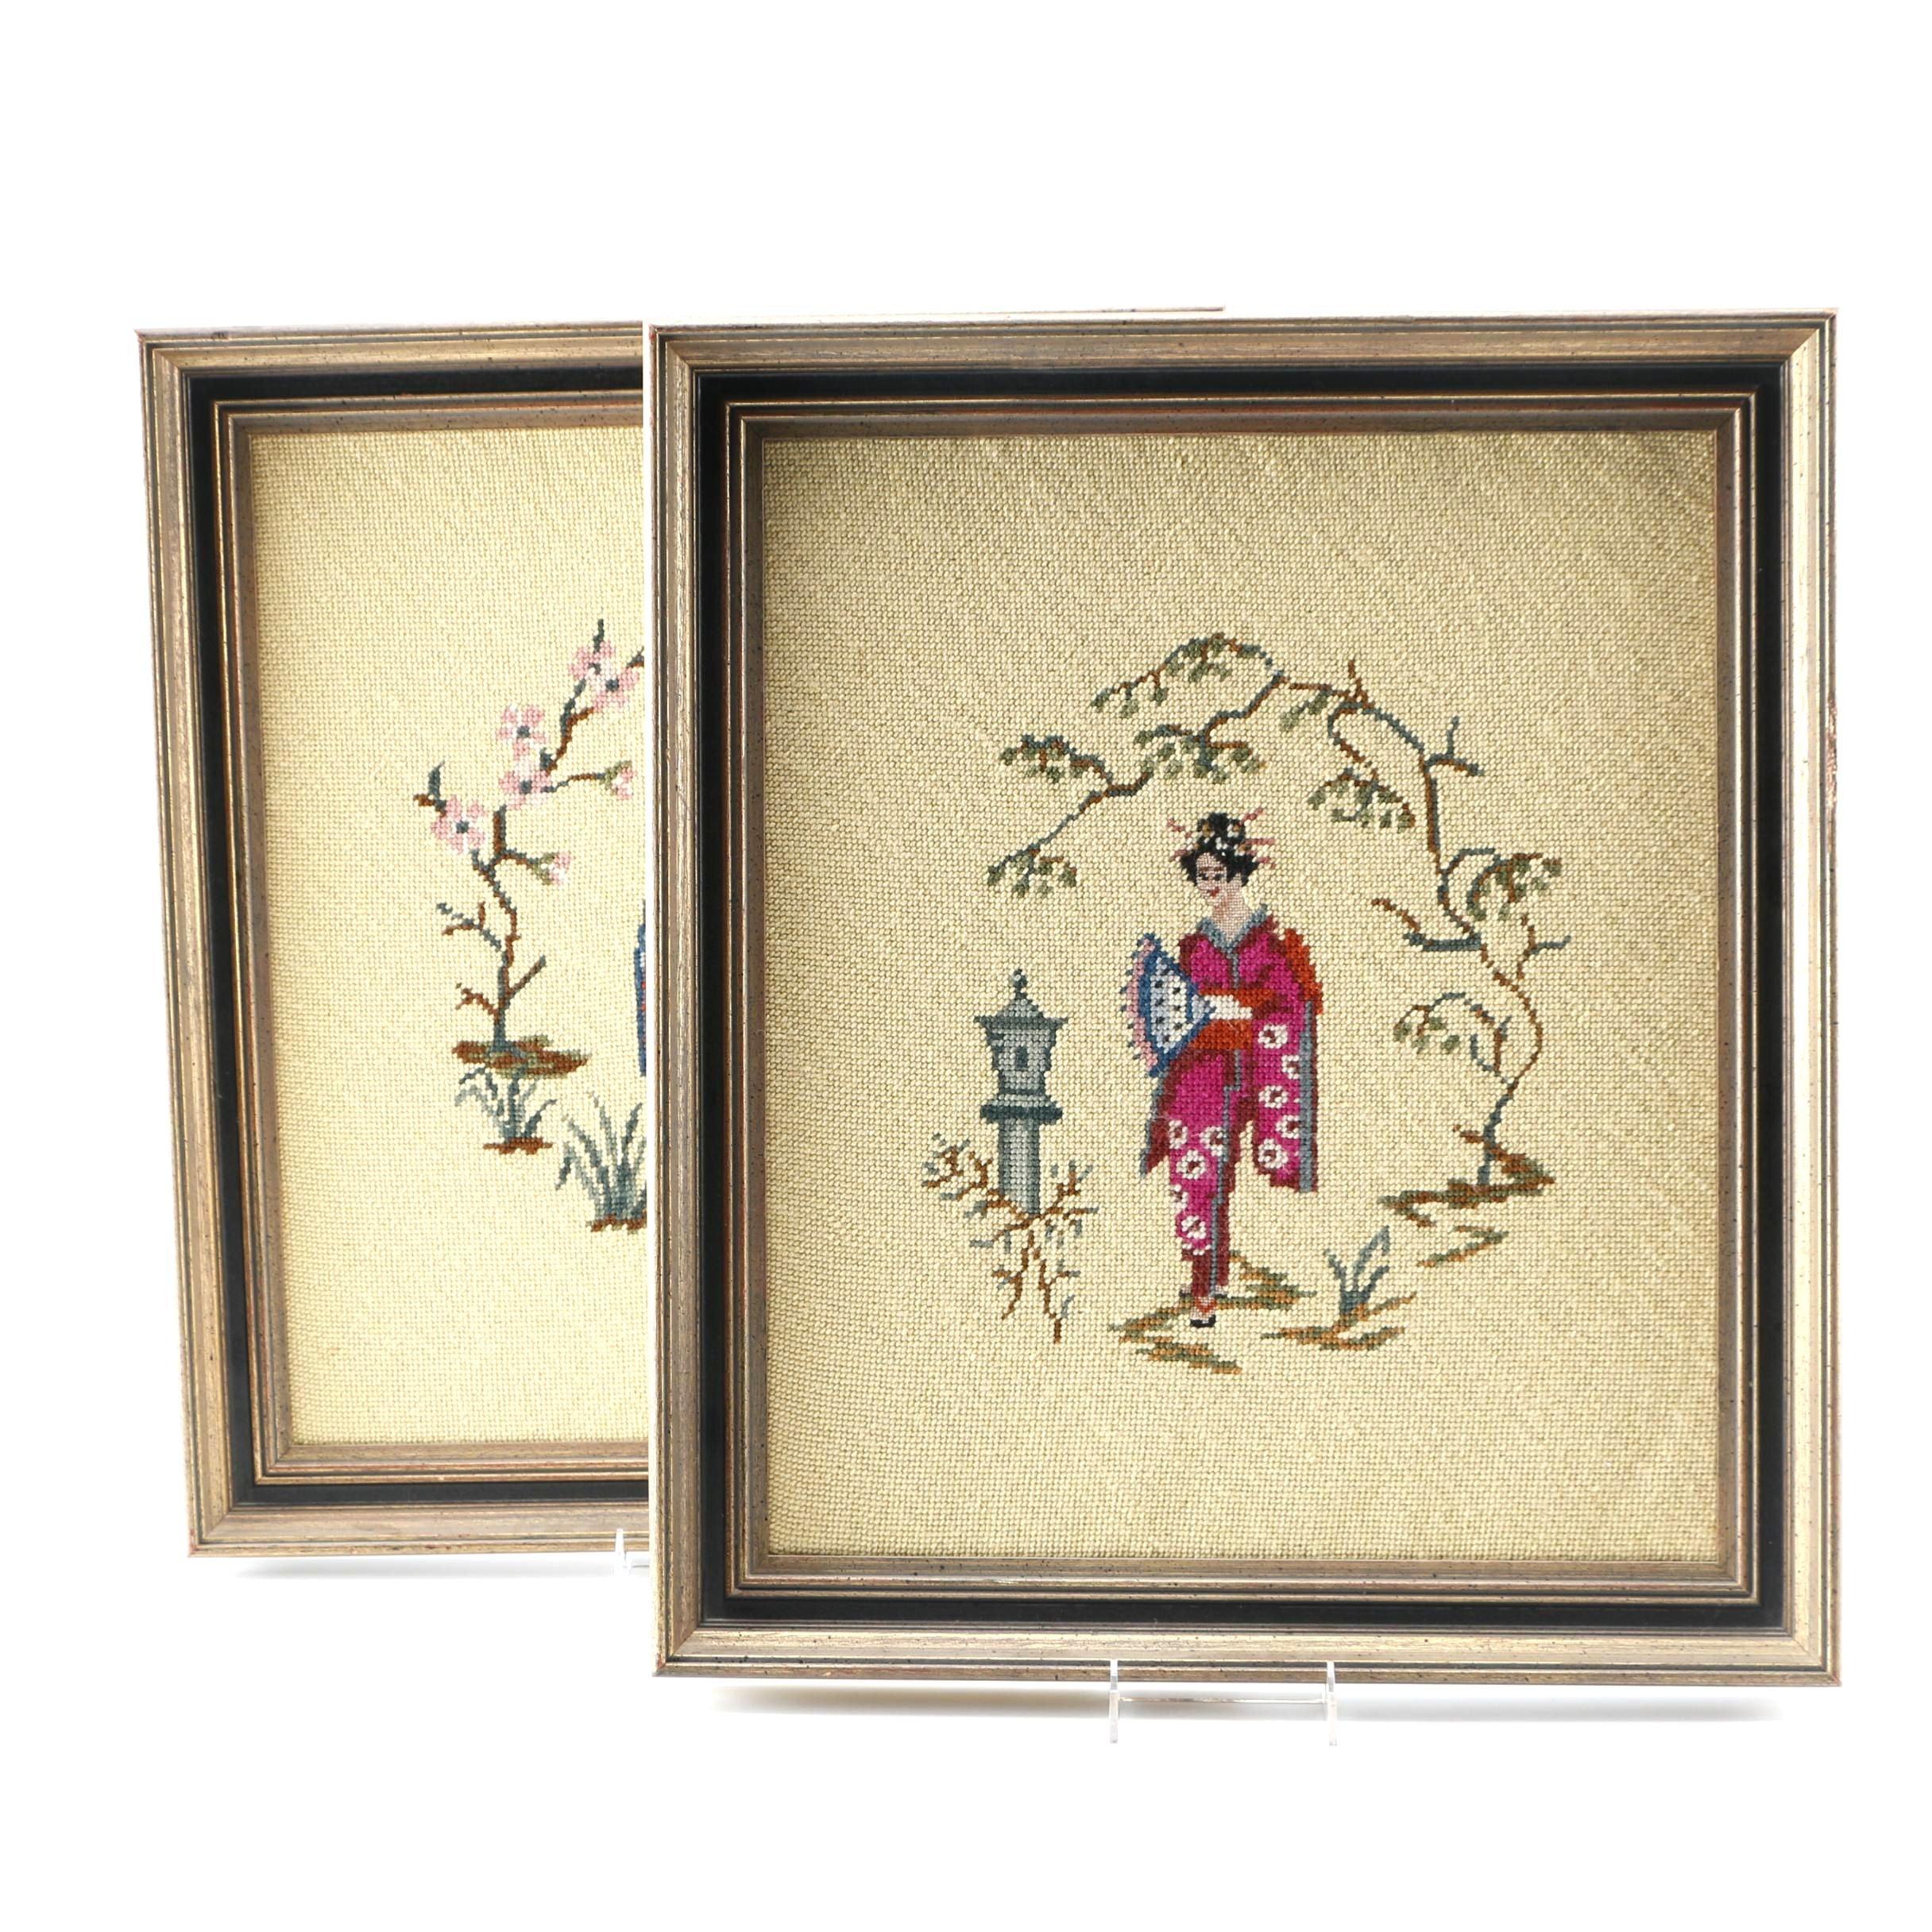 Pair of Framed Japanese Style Needlepoints